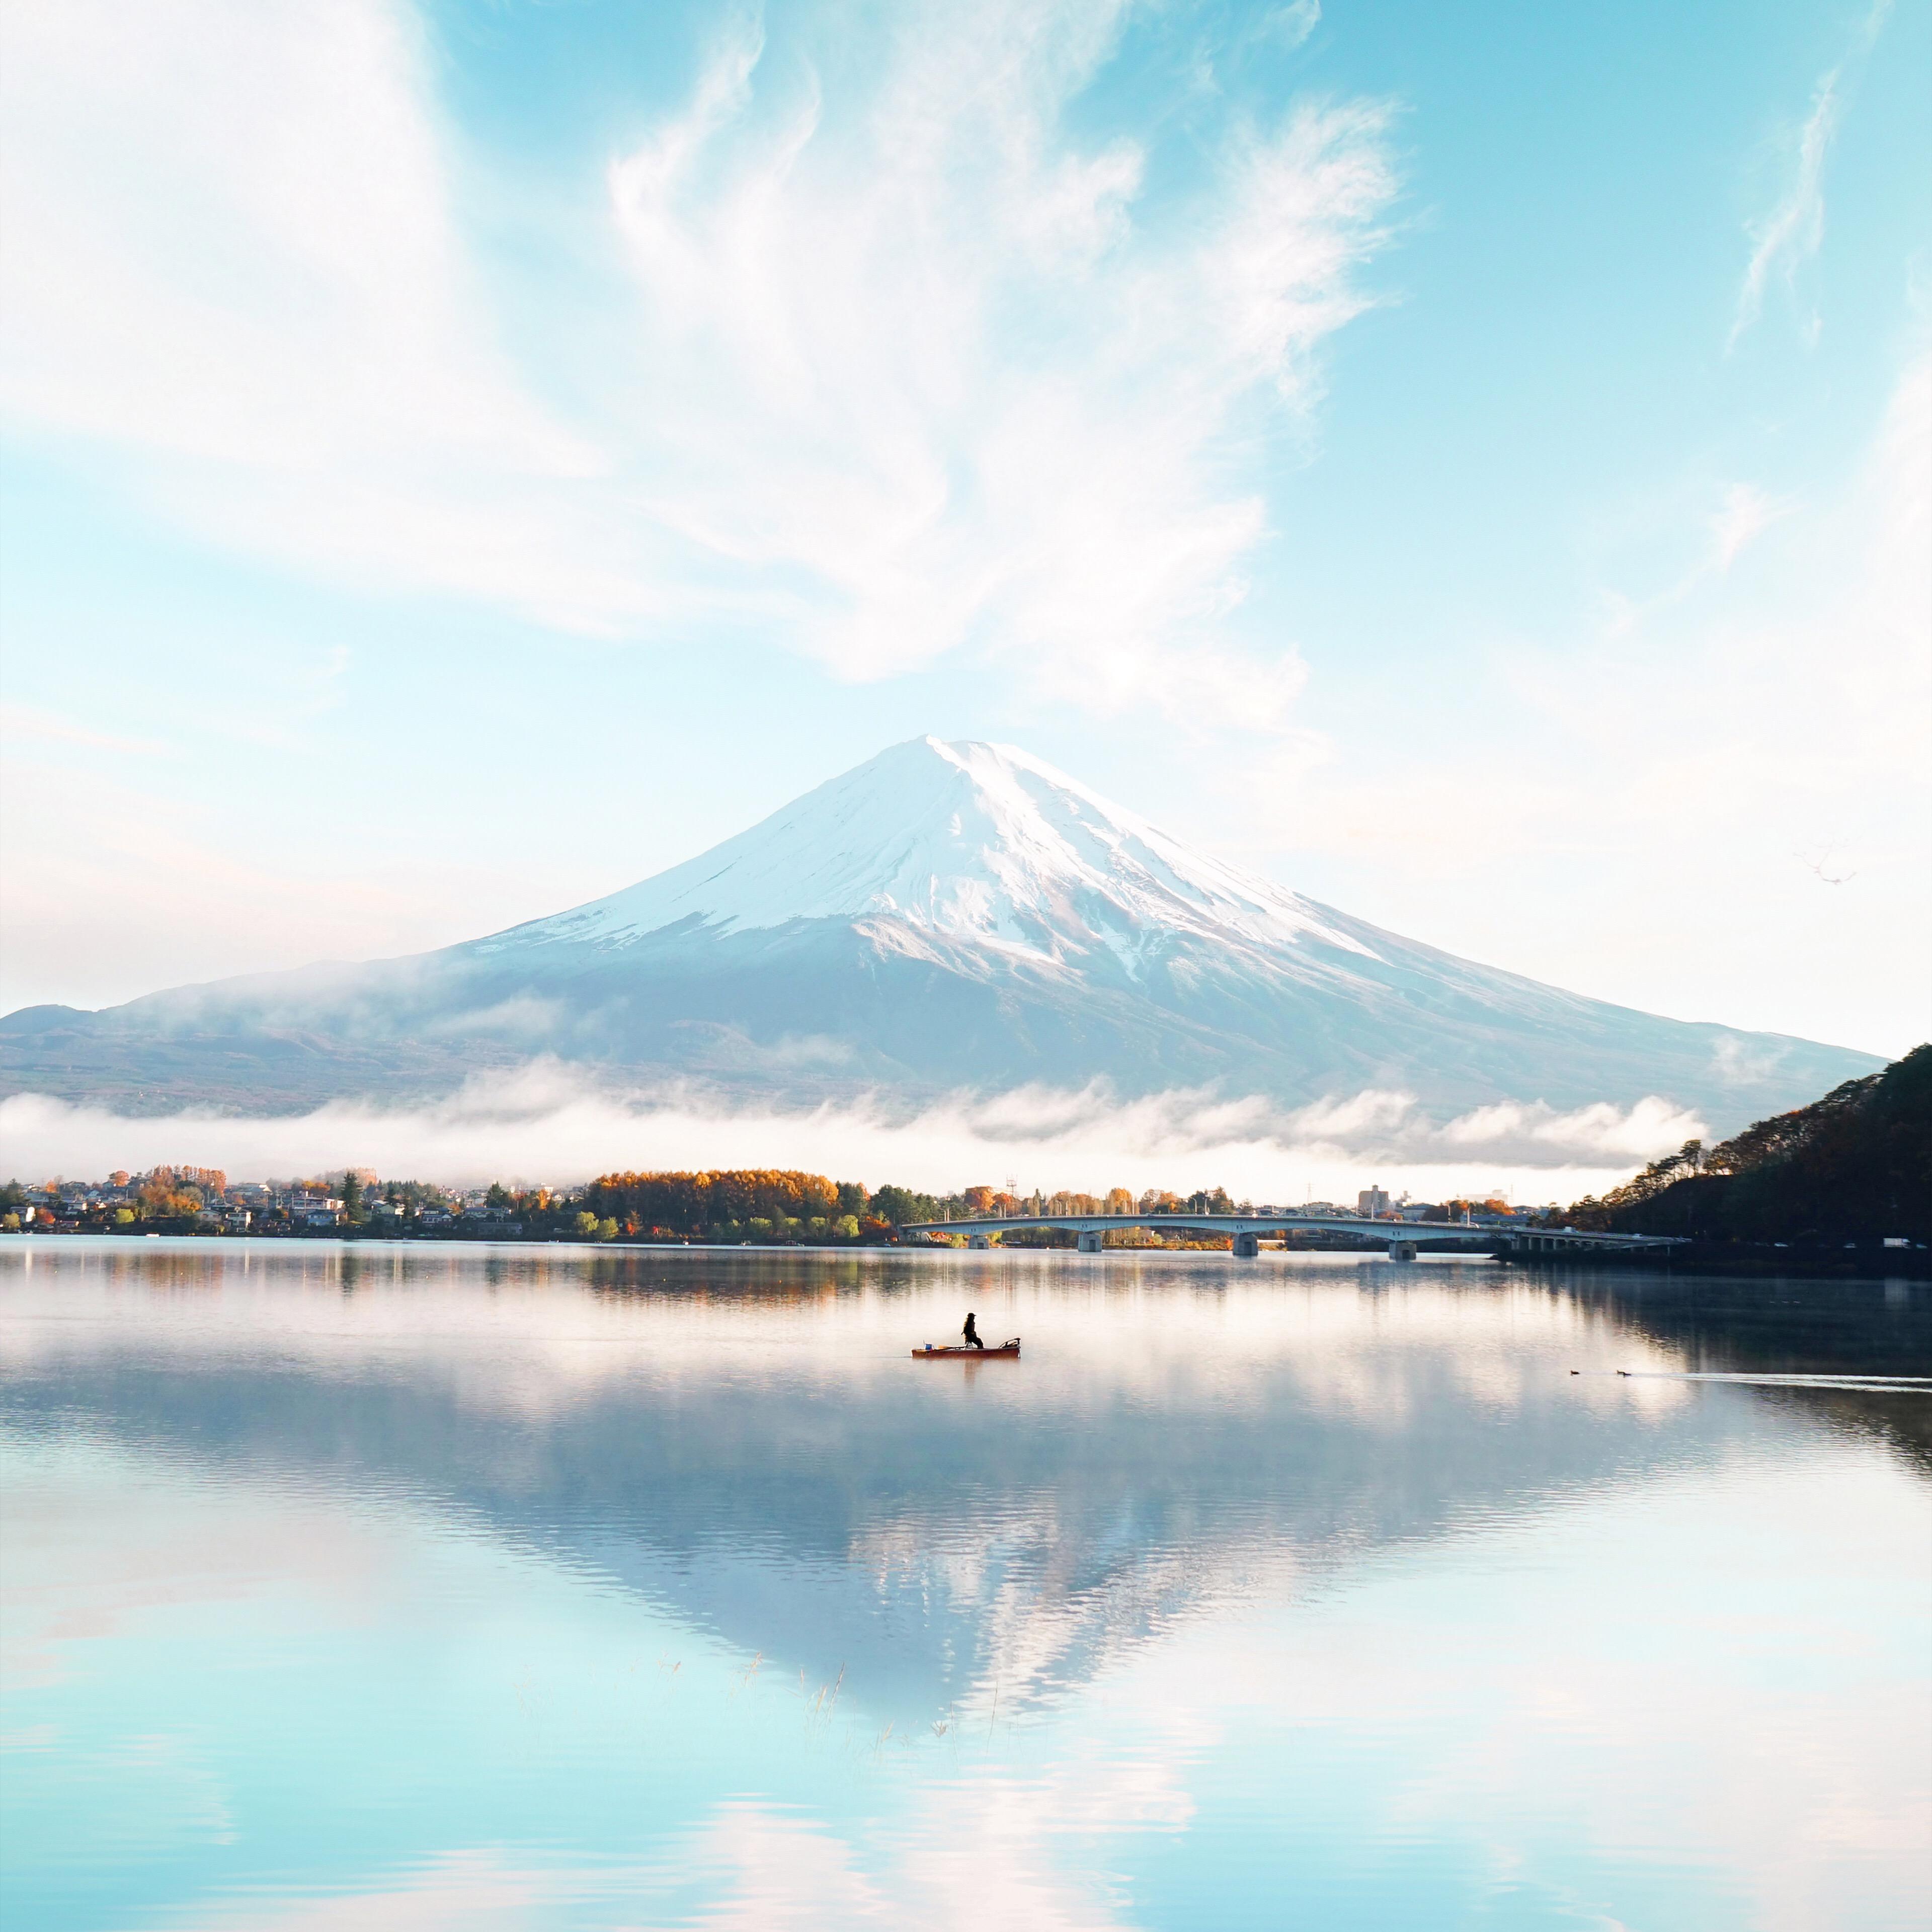 Smartphone Wallpaper 4k Nature: Mount Fuji Blue Bright Day 4k, HD Nature, 4k Wallpapers